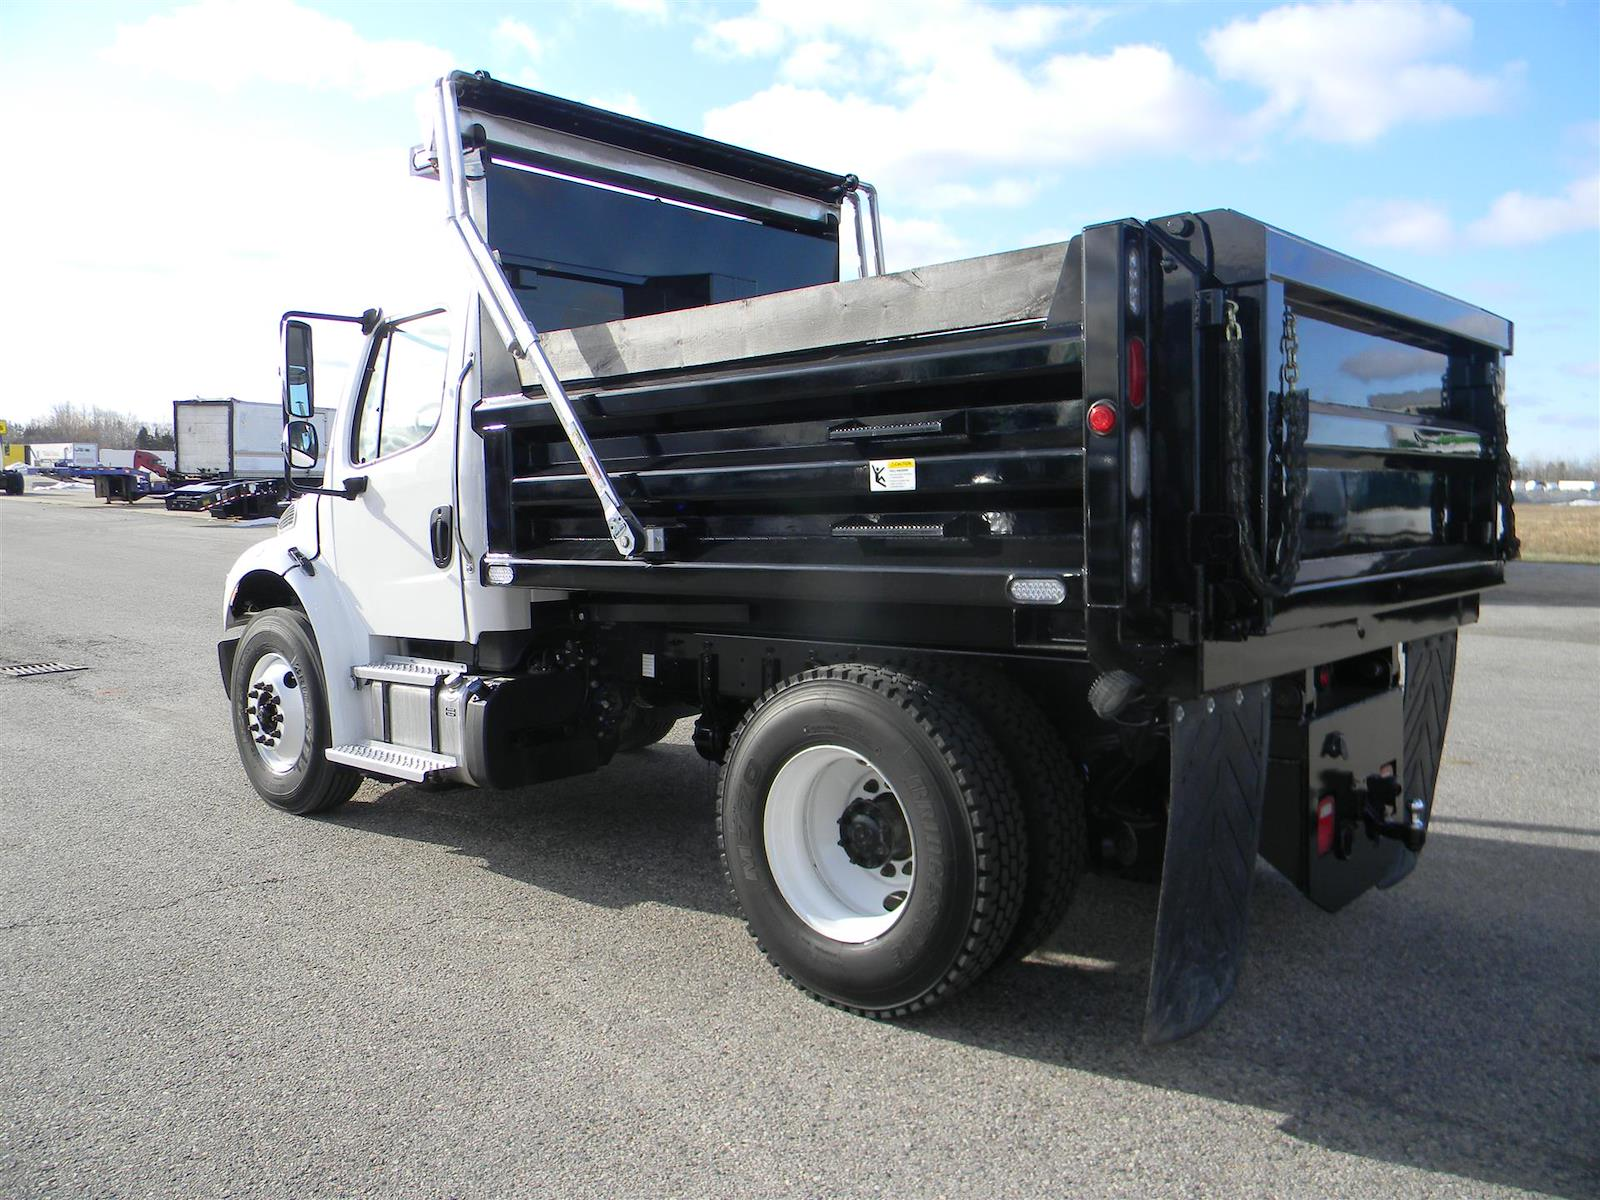 2019 Freightliner Truck 4x2, Dump Body #110944 - photo 1